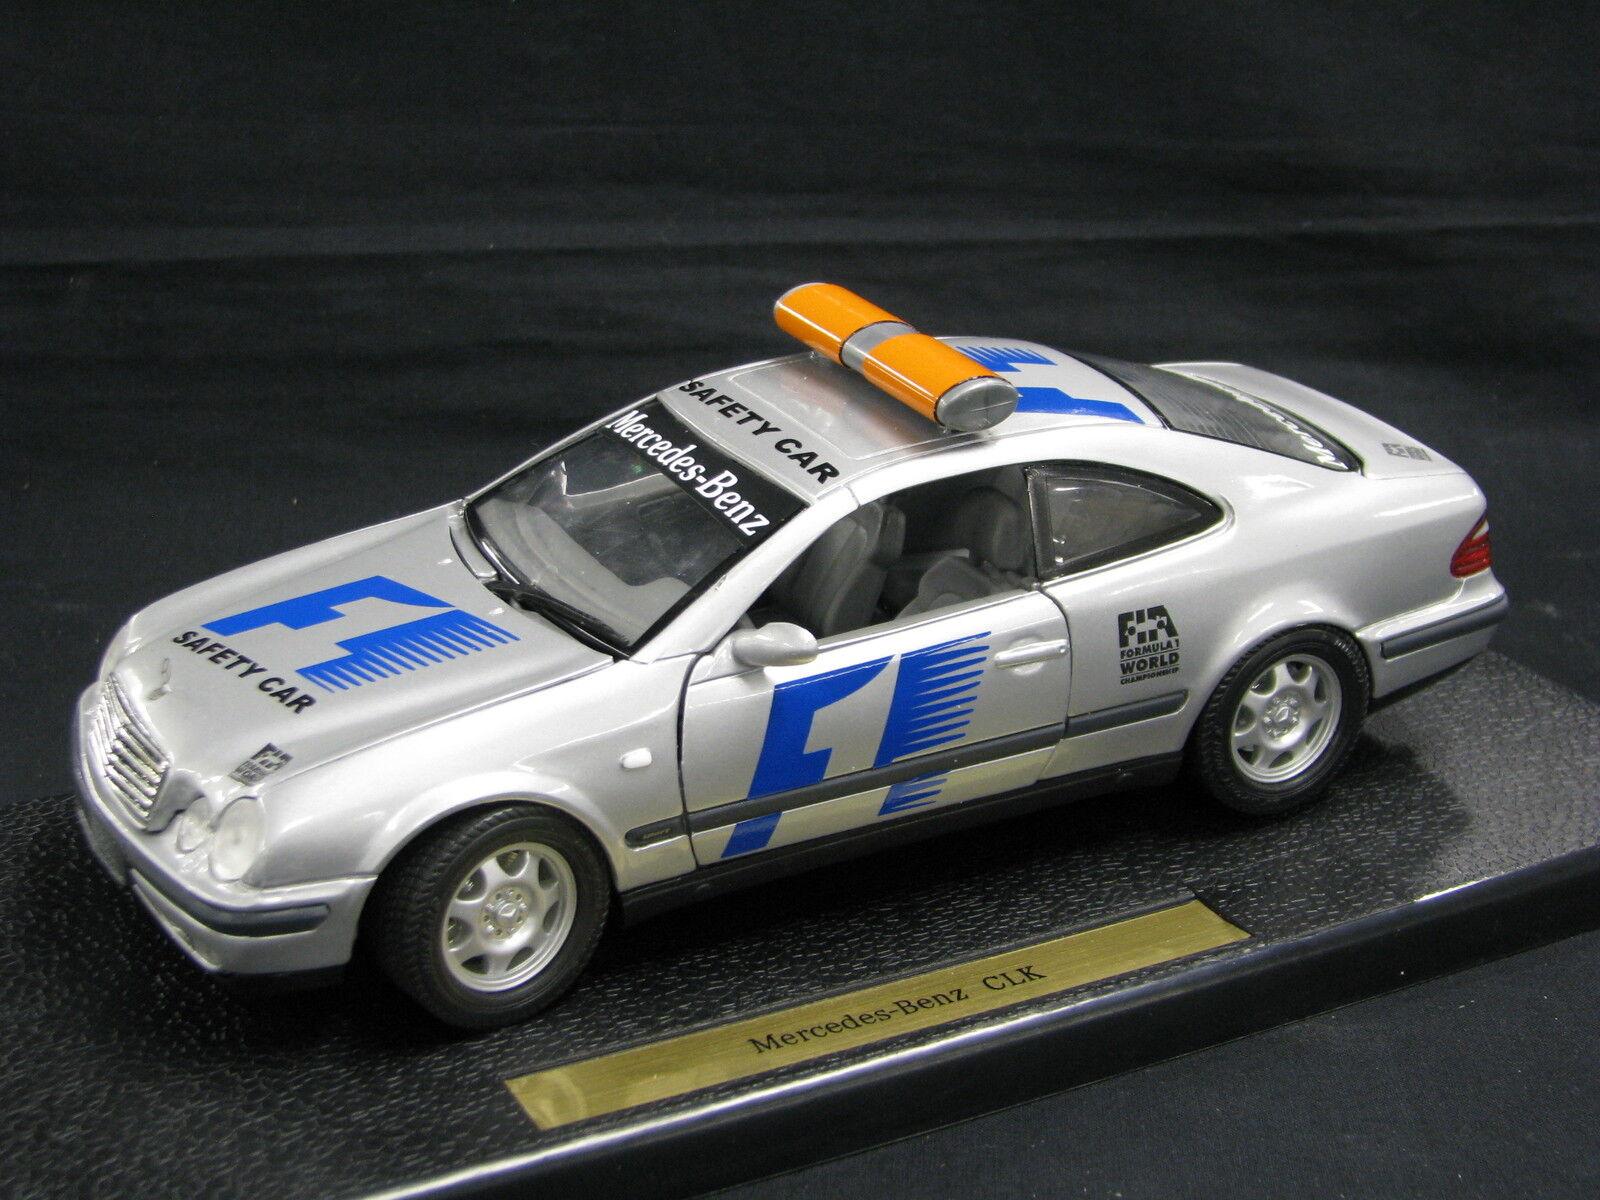 Anson  Mercedes-Benz CLK 1 18 Formula 1 Safety voiture (JS)  grande remise